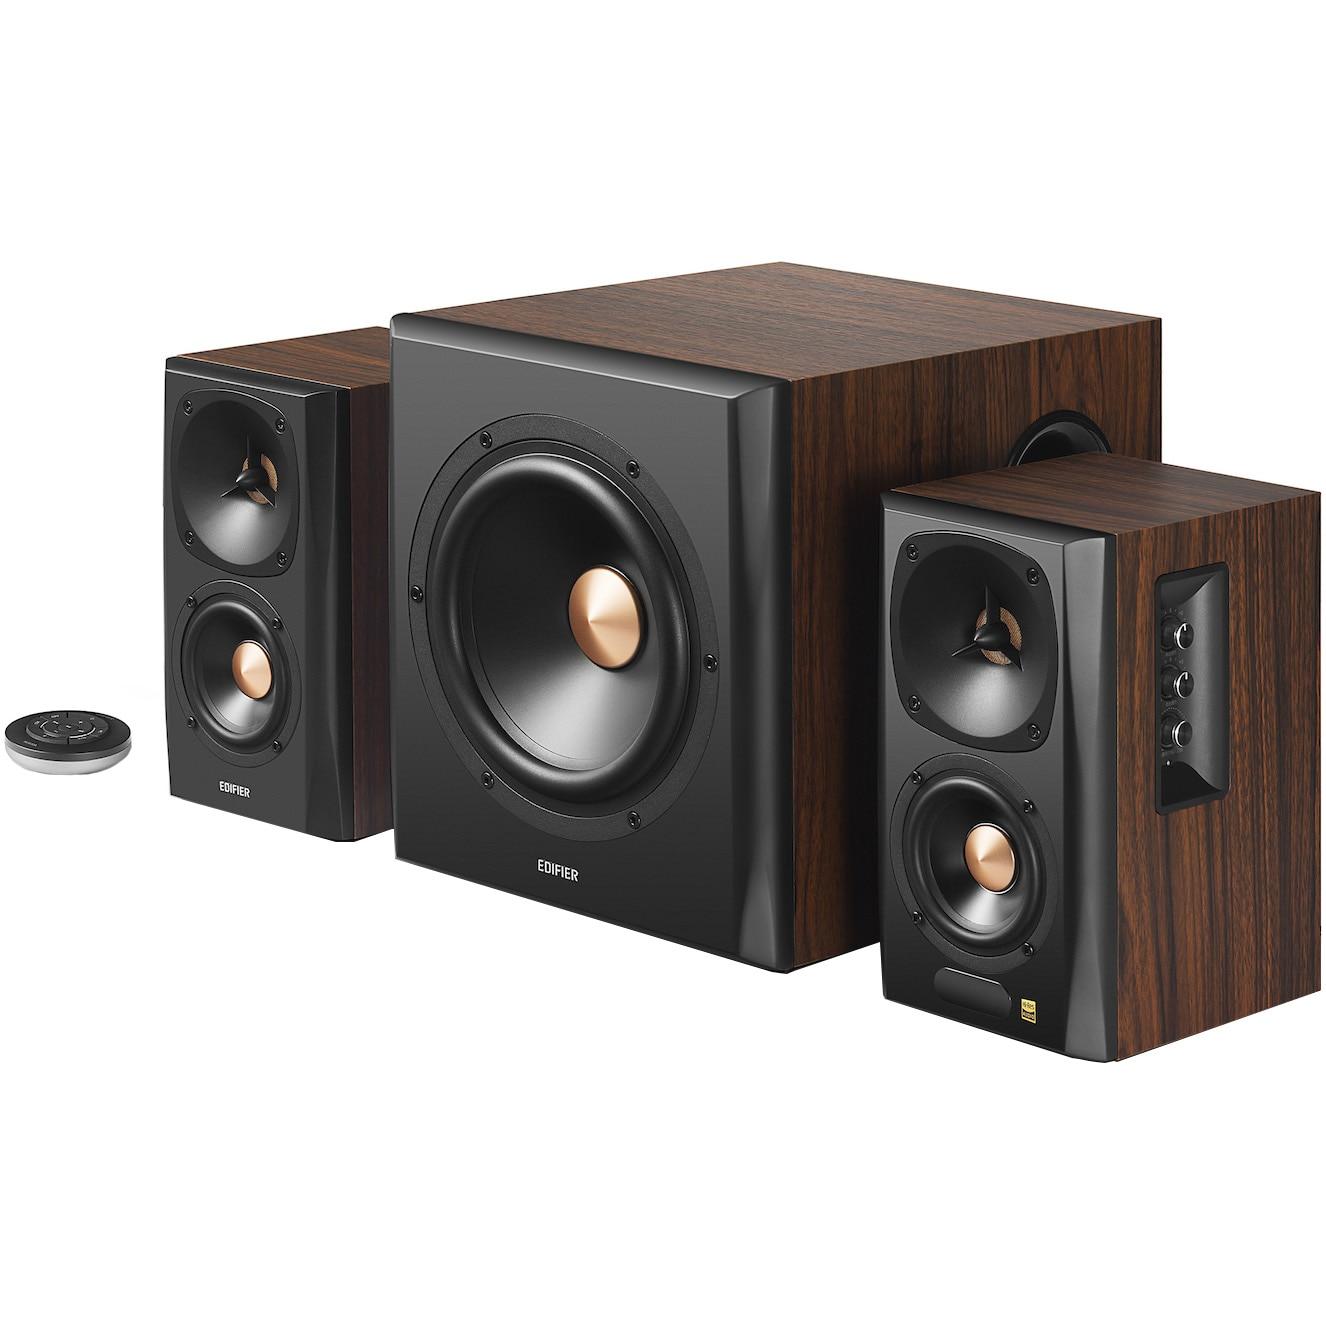 Fotografie Boxe Edifier 2.1 S360DB, 155W, Bluetooth, Telecomanda, Brown